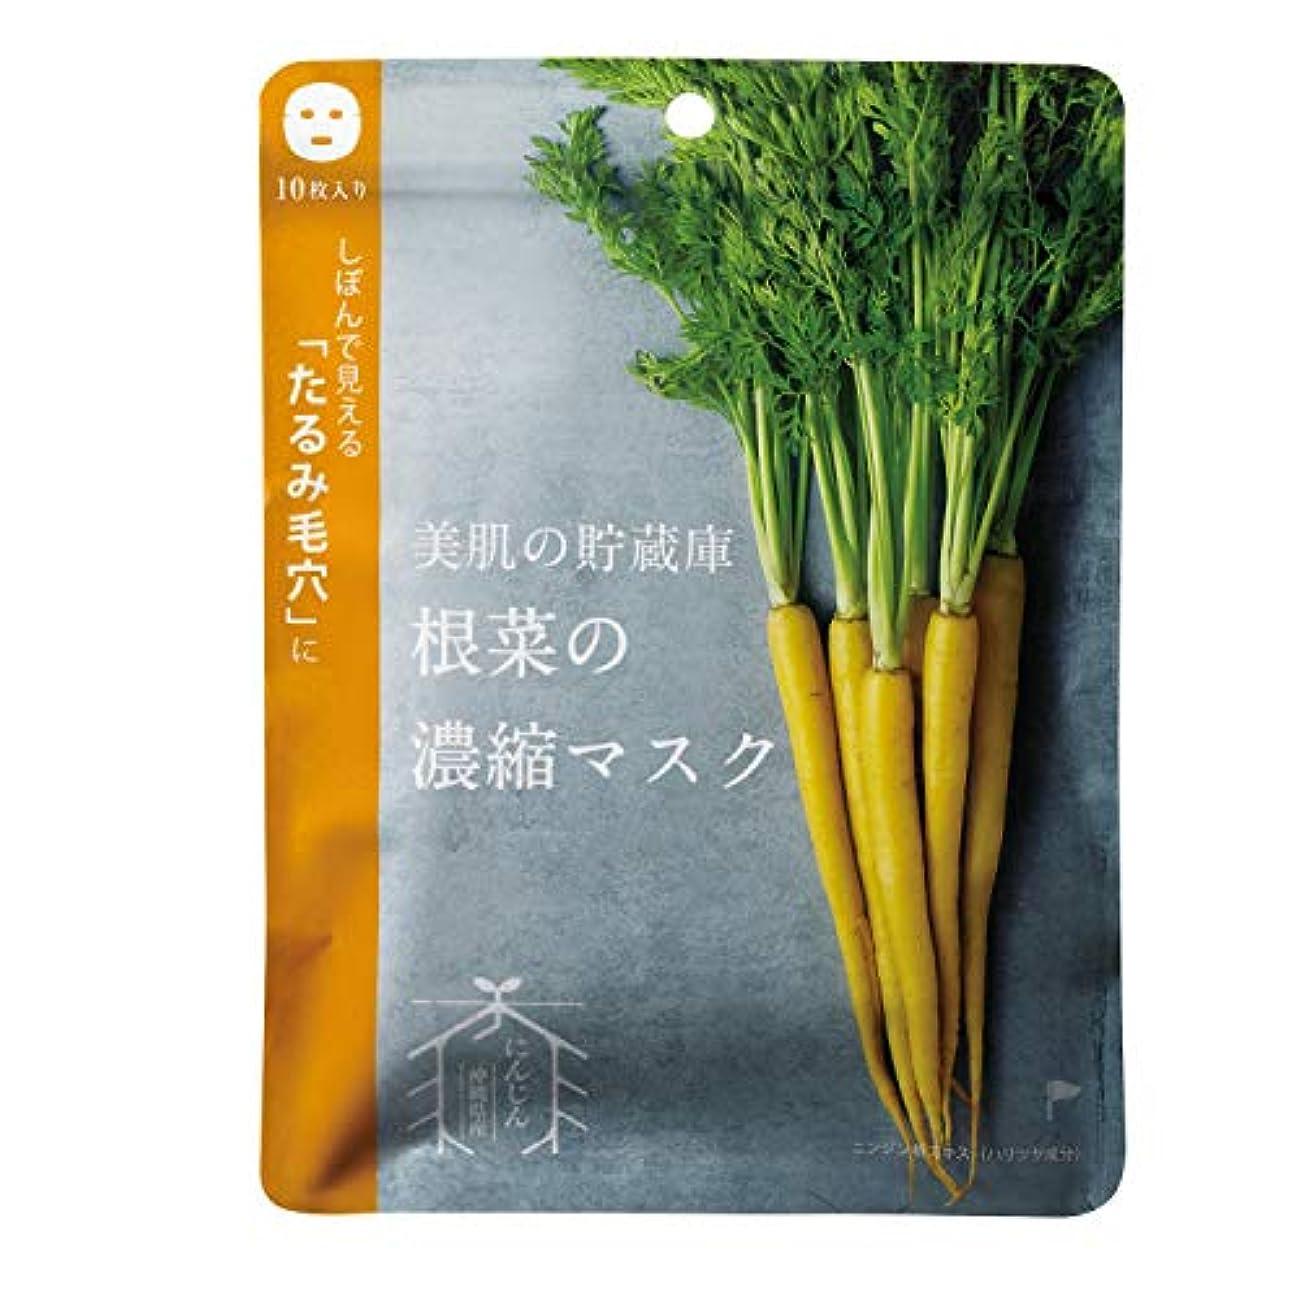 @cosme nippon 美肌の貯蔵庫 根菜の濃縮マスク 島にんじん 10枚 160ml